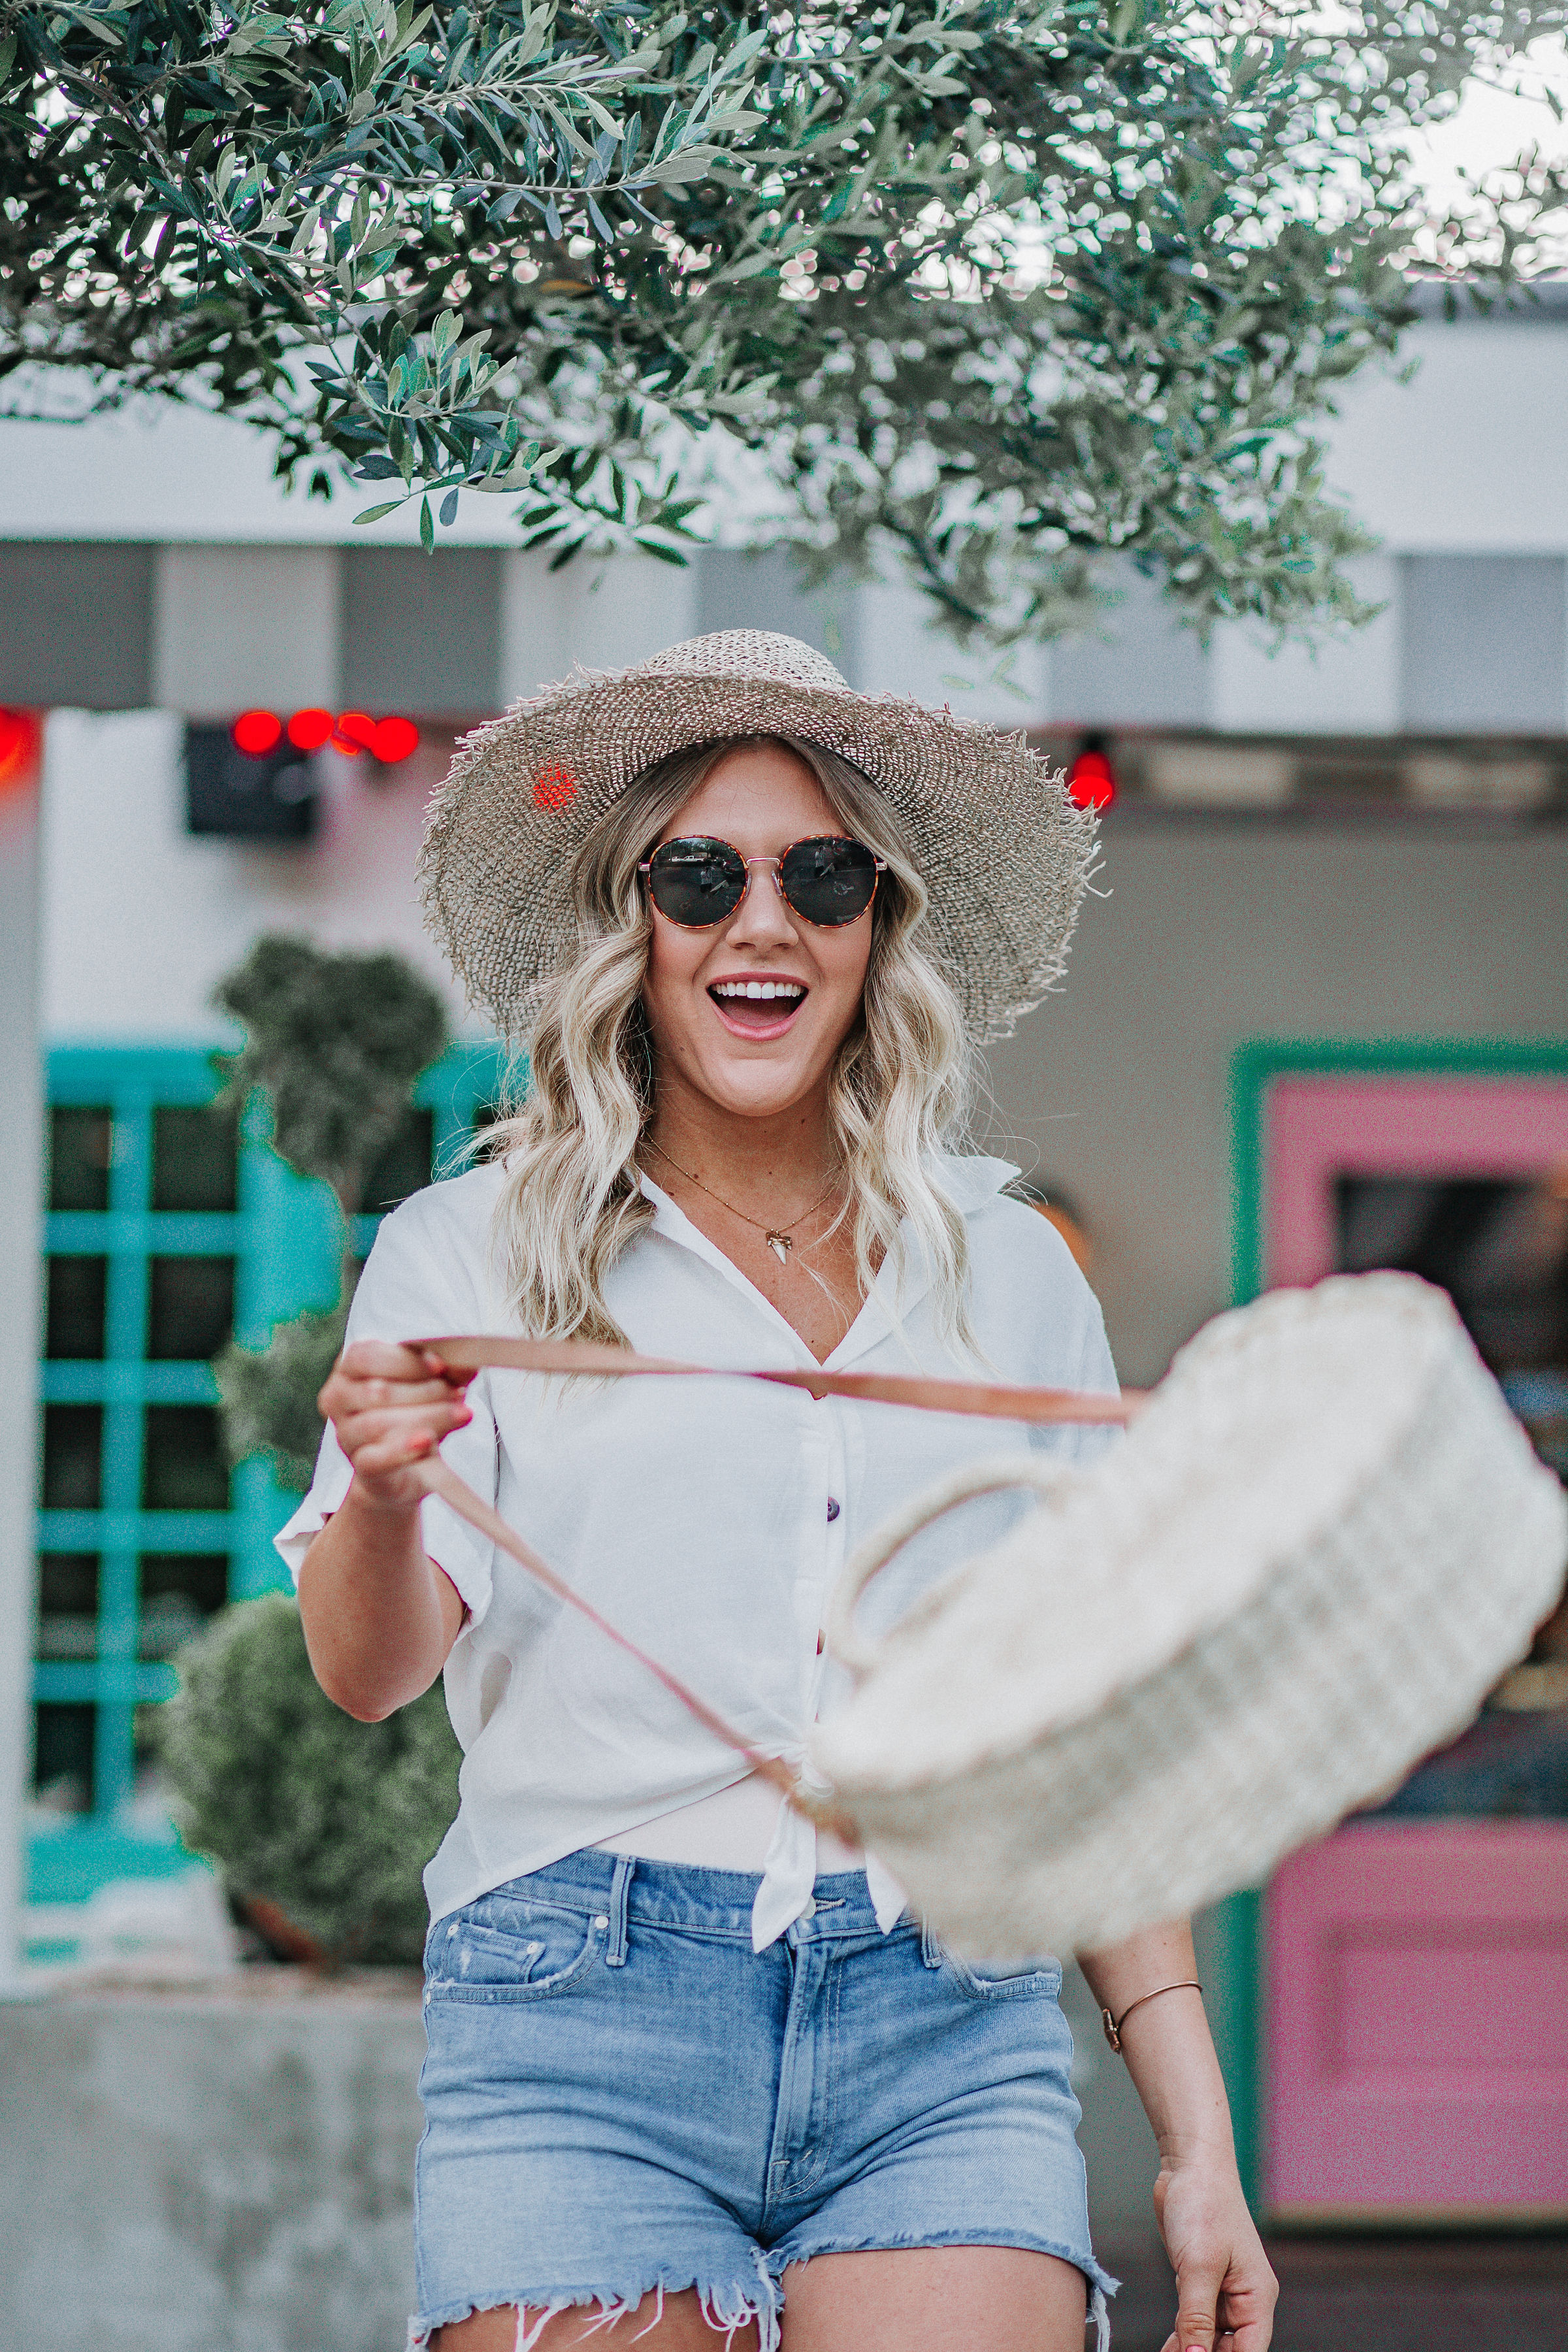 via Thea: Fun Bachelorette or Bachelor Party Ideas in Austin Texas